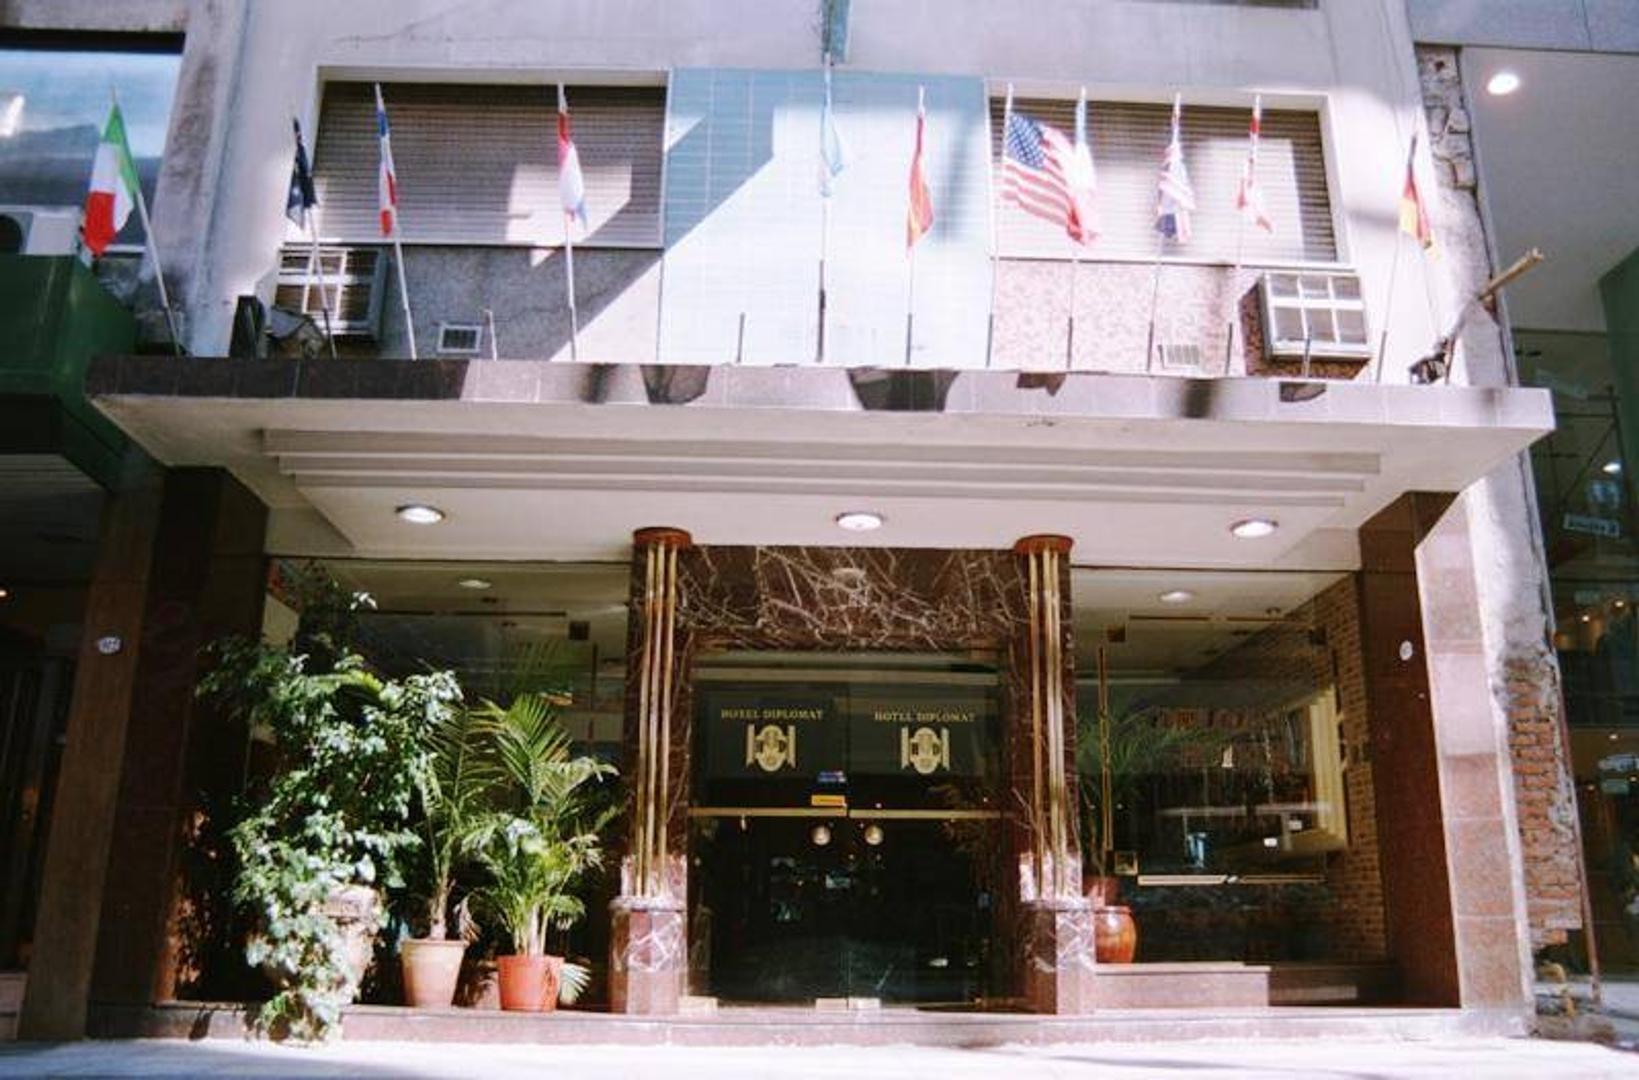 San Martin al 900 : Hotel en Plaza San Martin Retiro